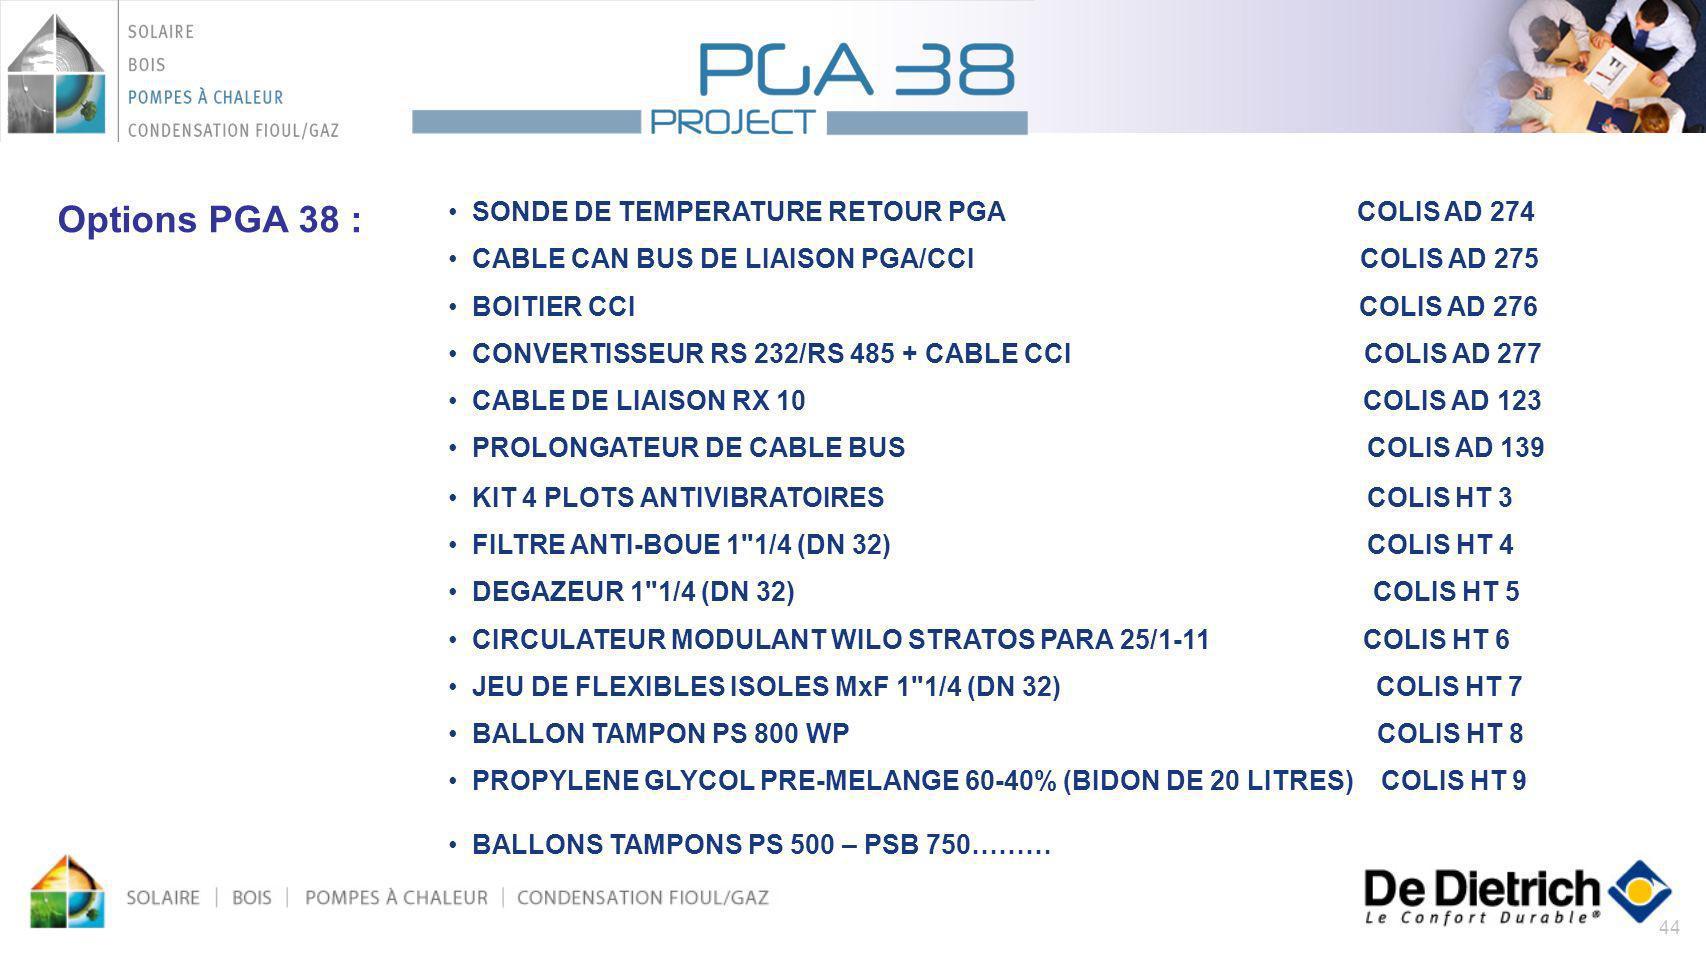 44 Options PGA 38 : SONDE DE TEMPERATURE RETOUR PGA COLIS AD 274 CABLE CAN BUS DE LIAISON PGA/CCI COLIS AD 275 BOITIER CCI COLIS AD 276 CONVERTISSEUR